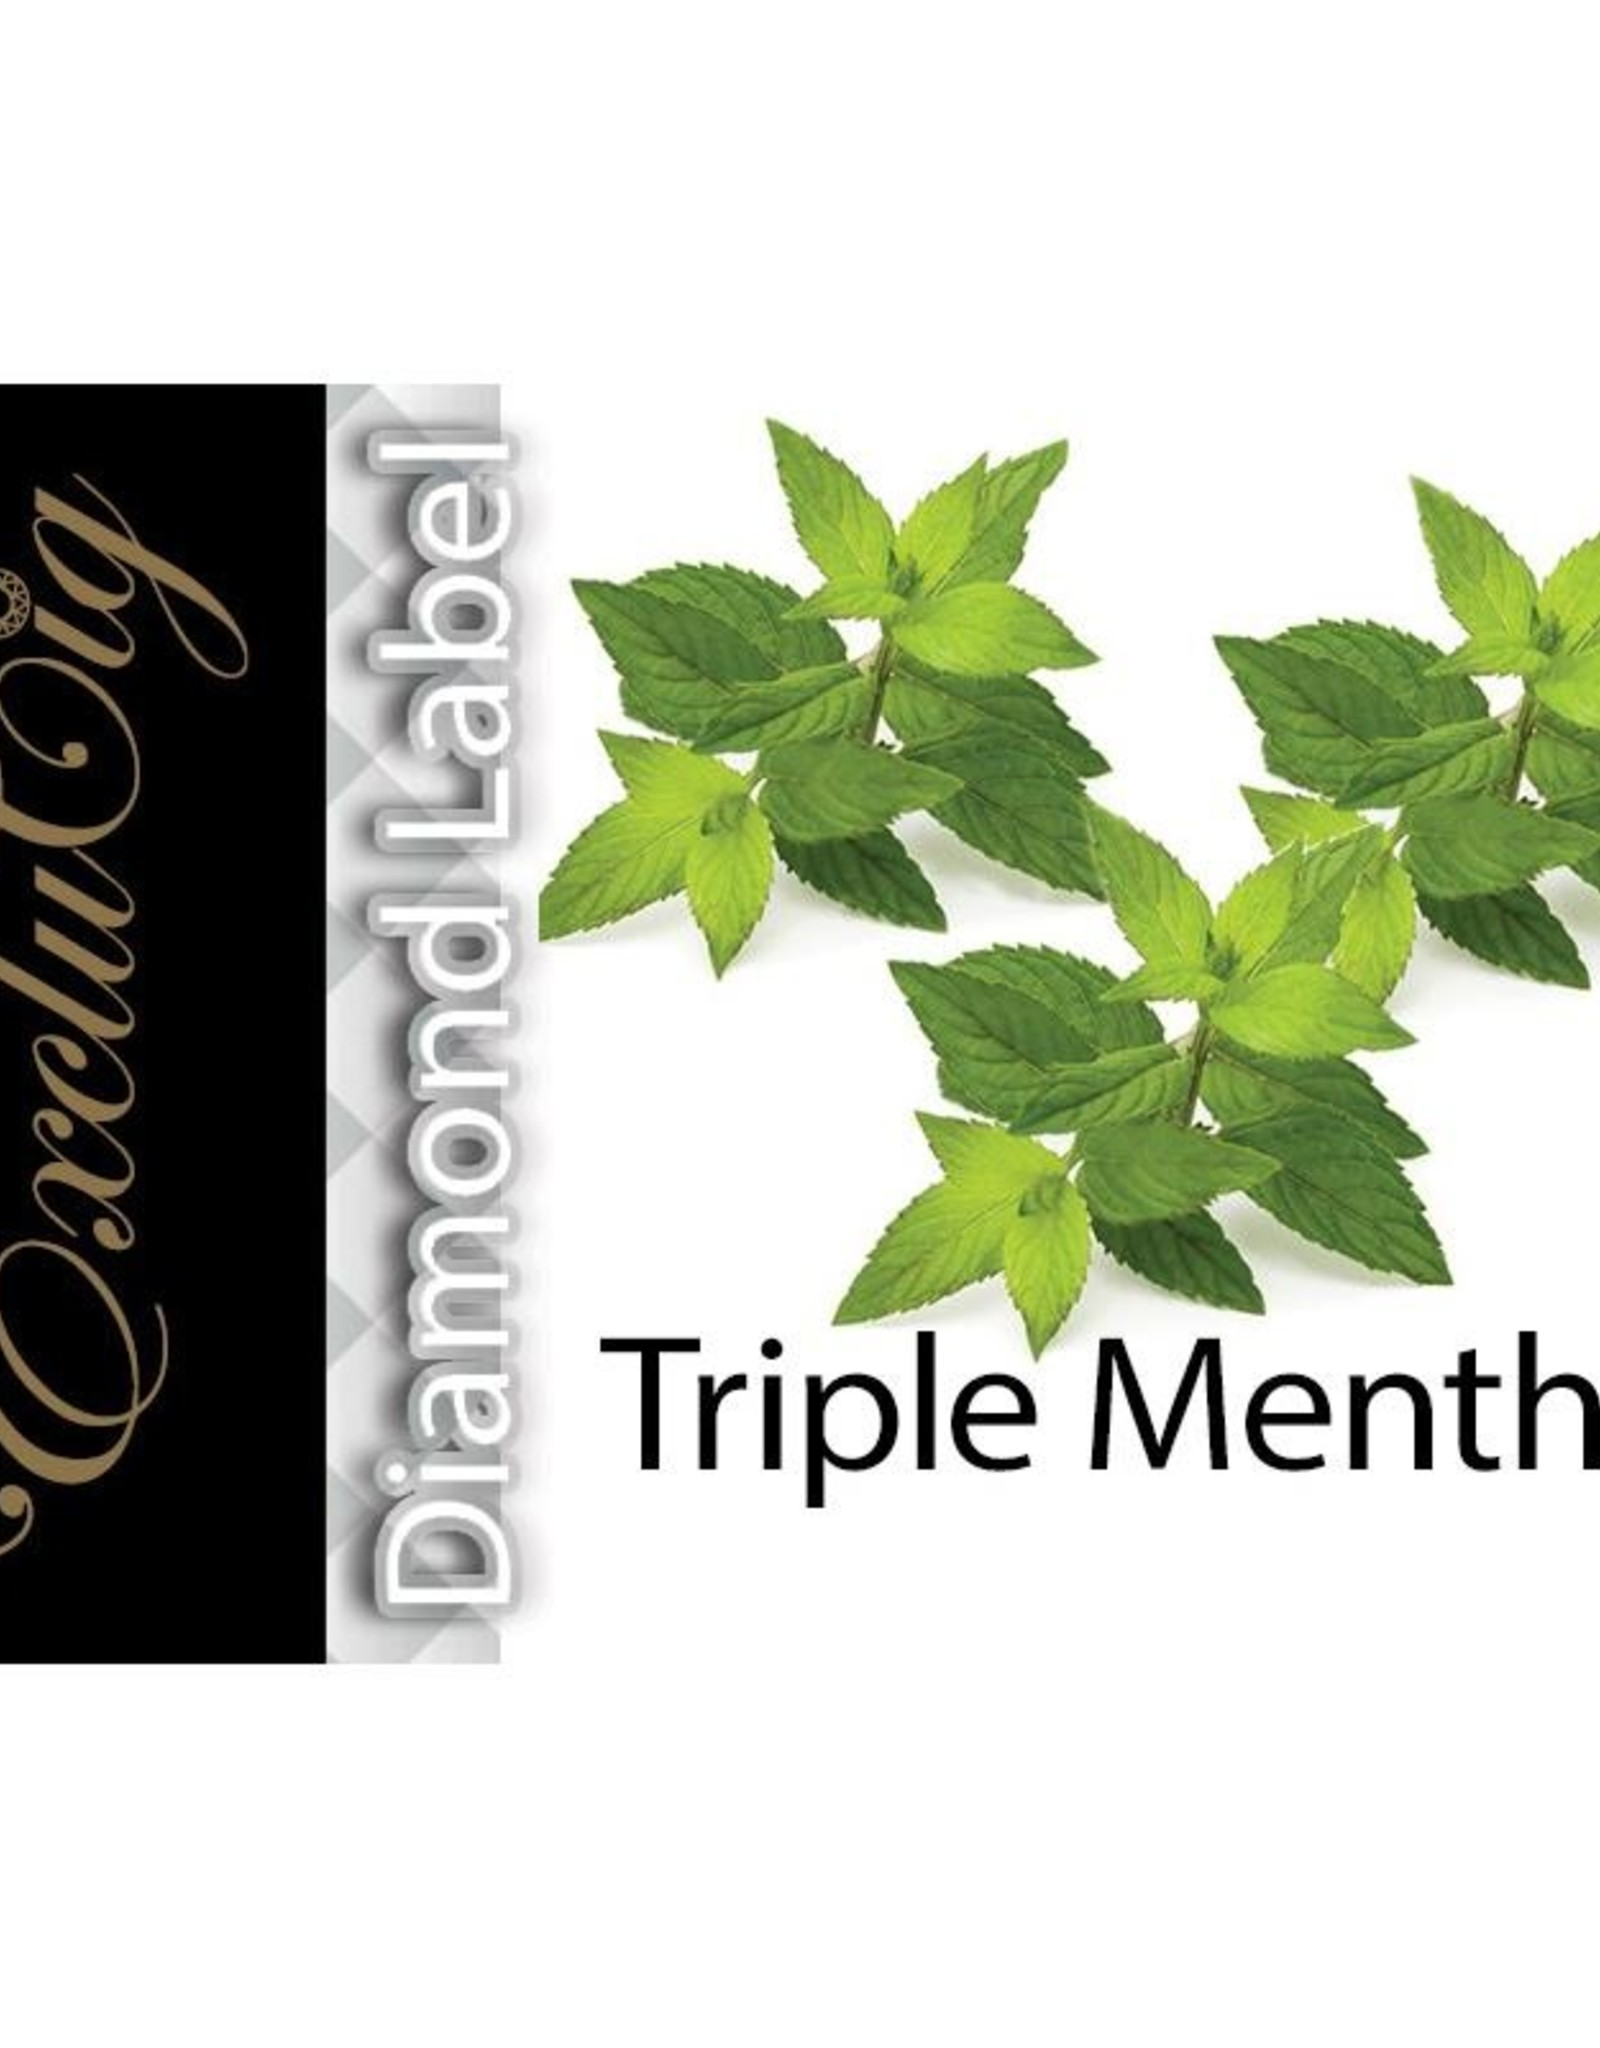 Exclucig Exclucig Diamond Label E-liquid Triple Menthol 6 mg Nicotine